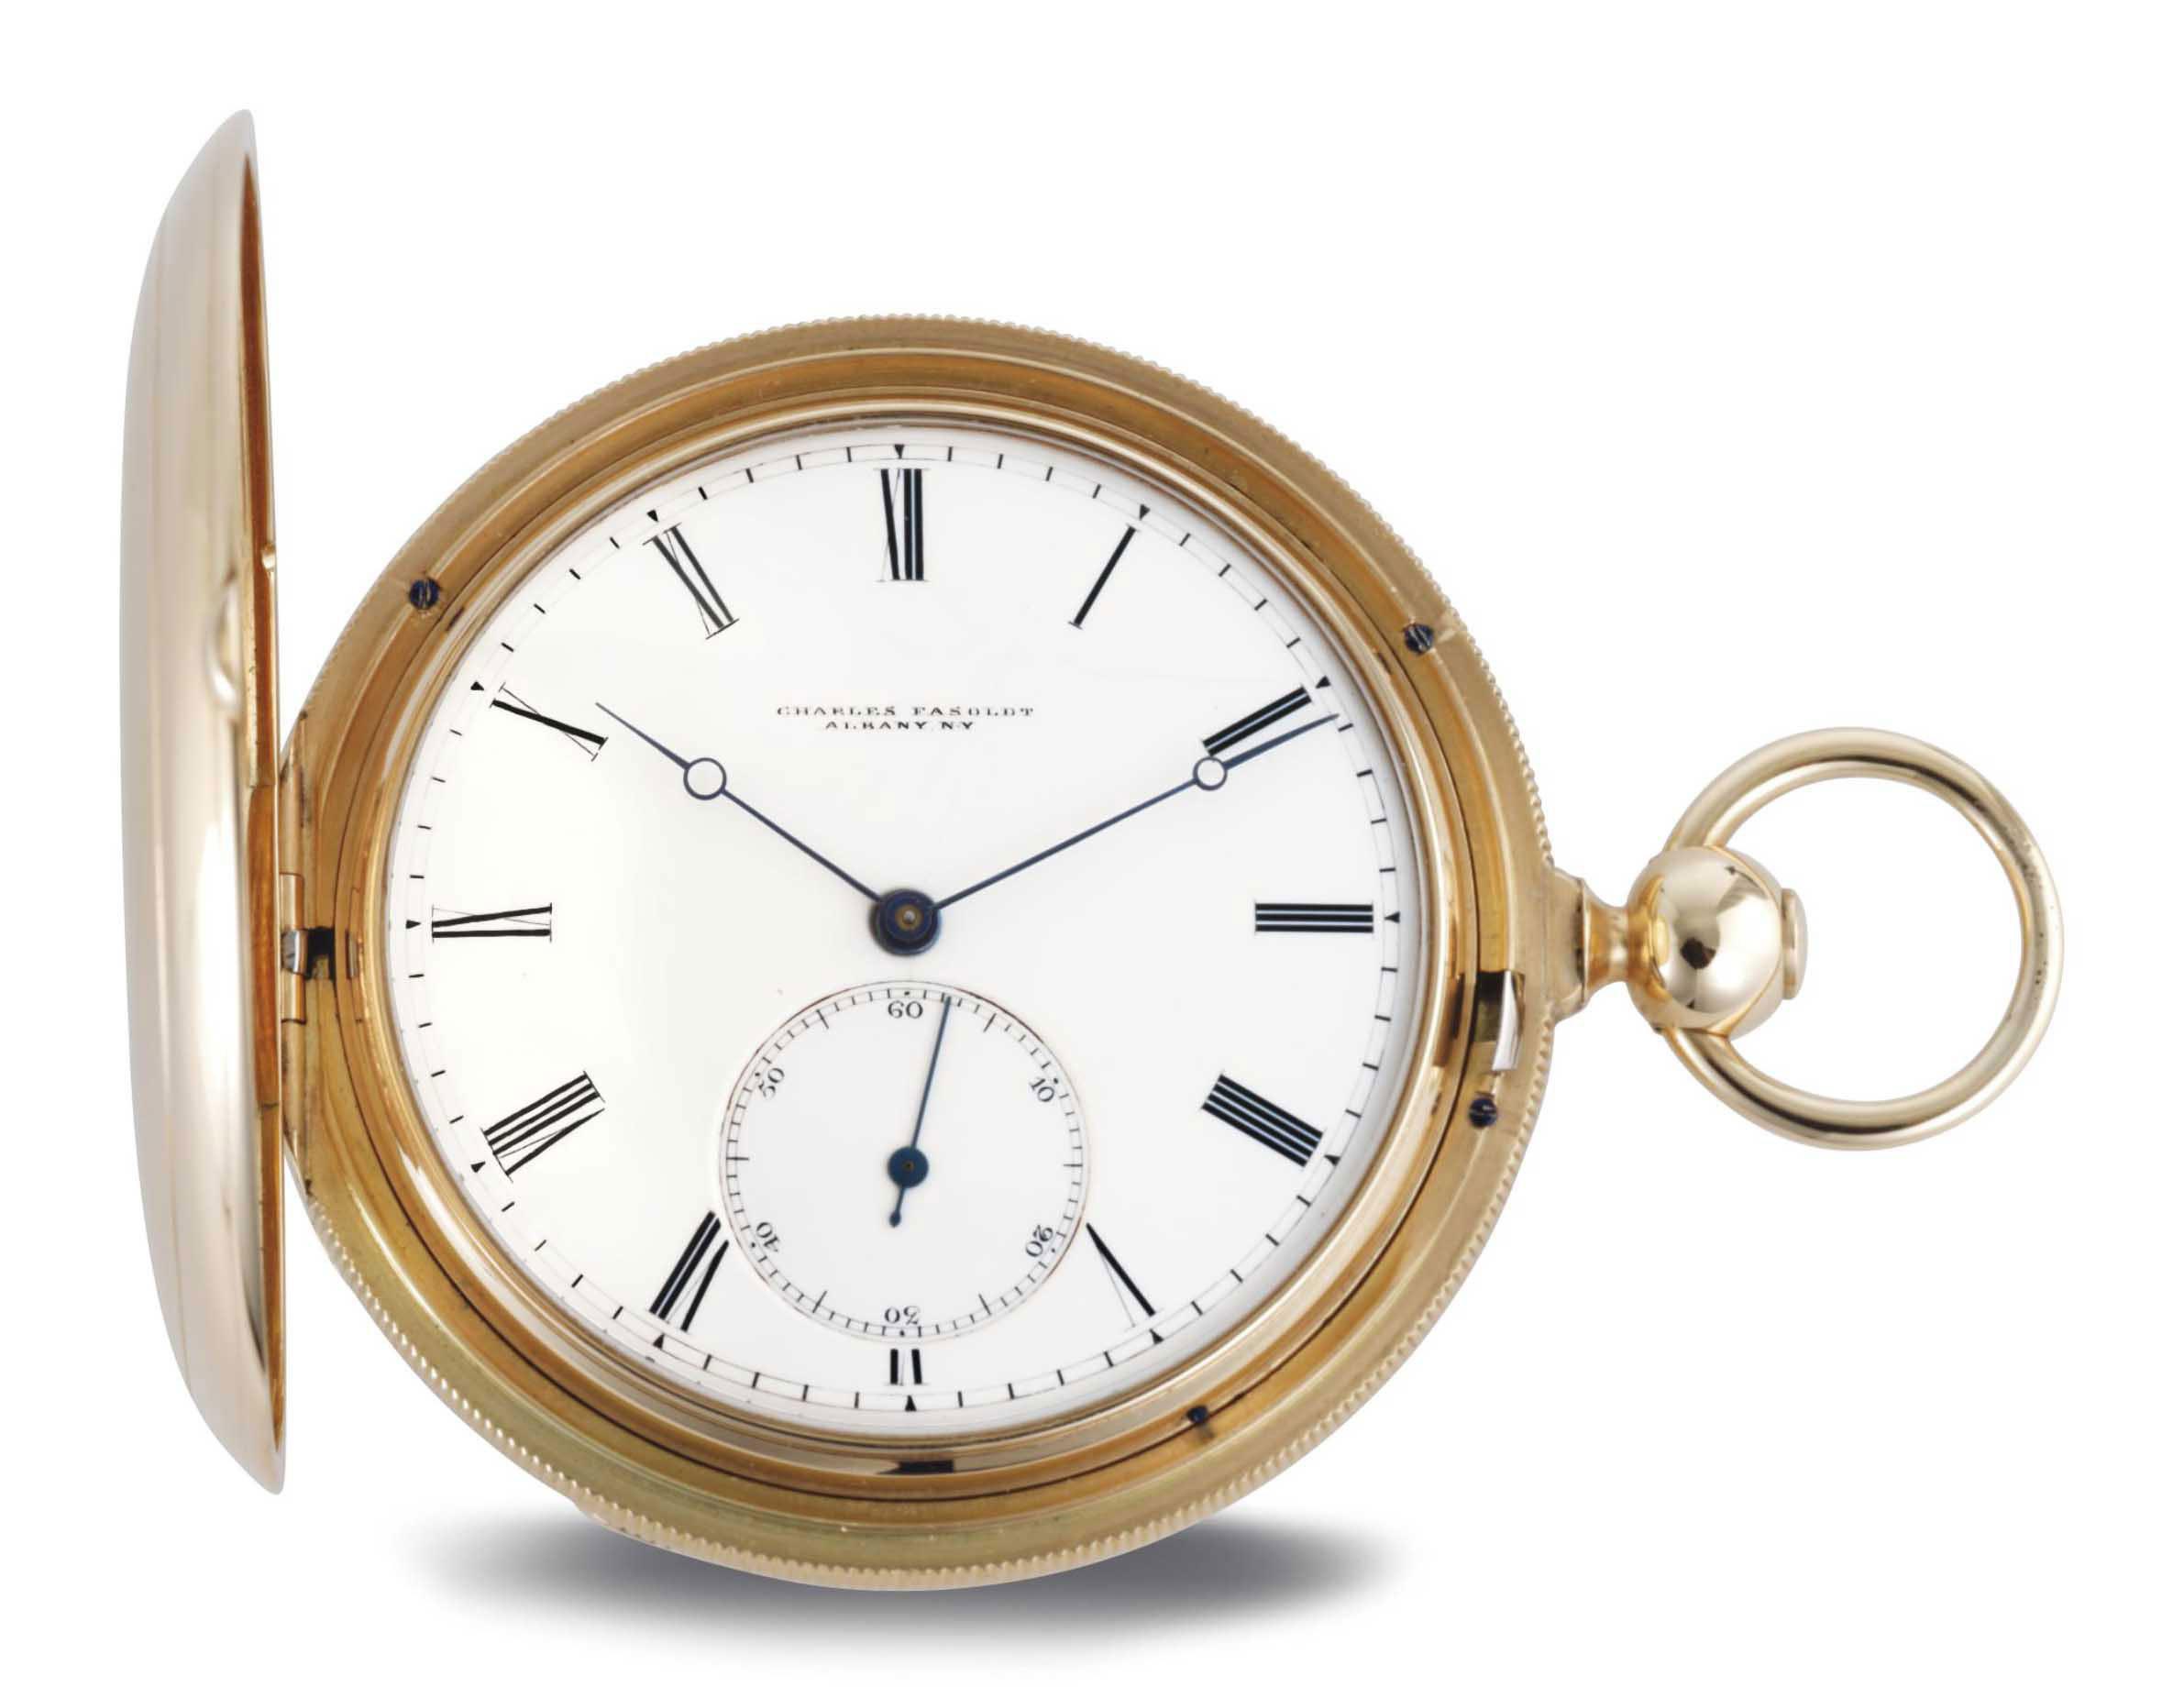 CHARLES FASOLDT. A FINE AND RARE 18K GOLD CABRIOLET KEYWOUND ISOCHRONAL POCKET CHRONOMETER